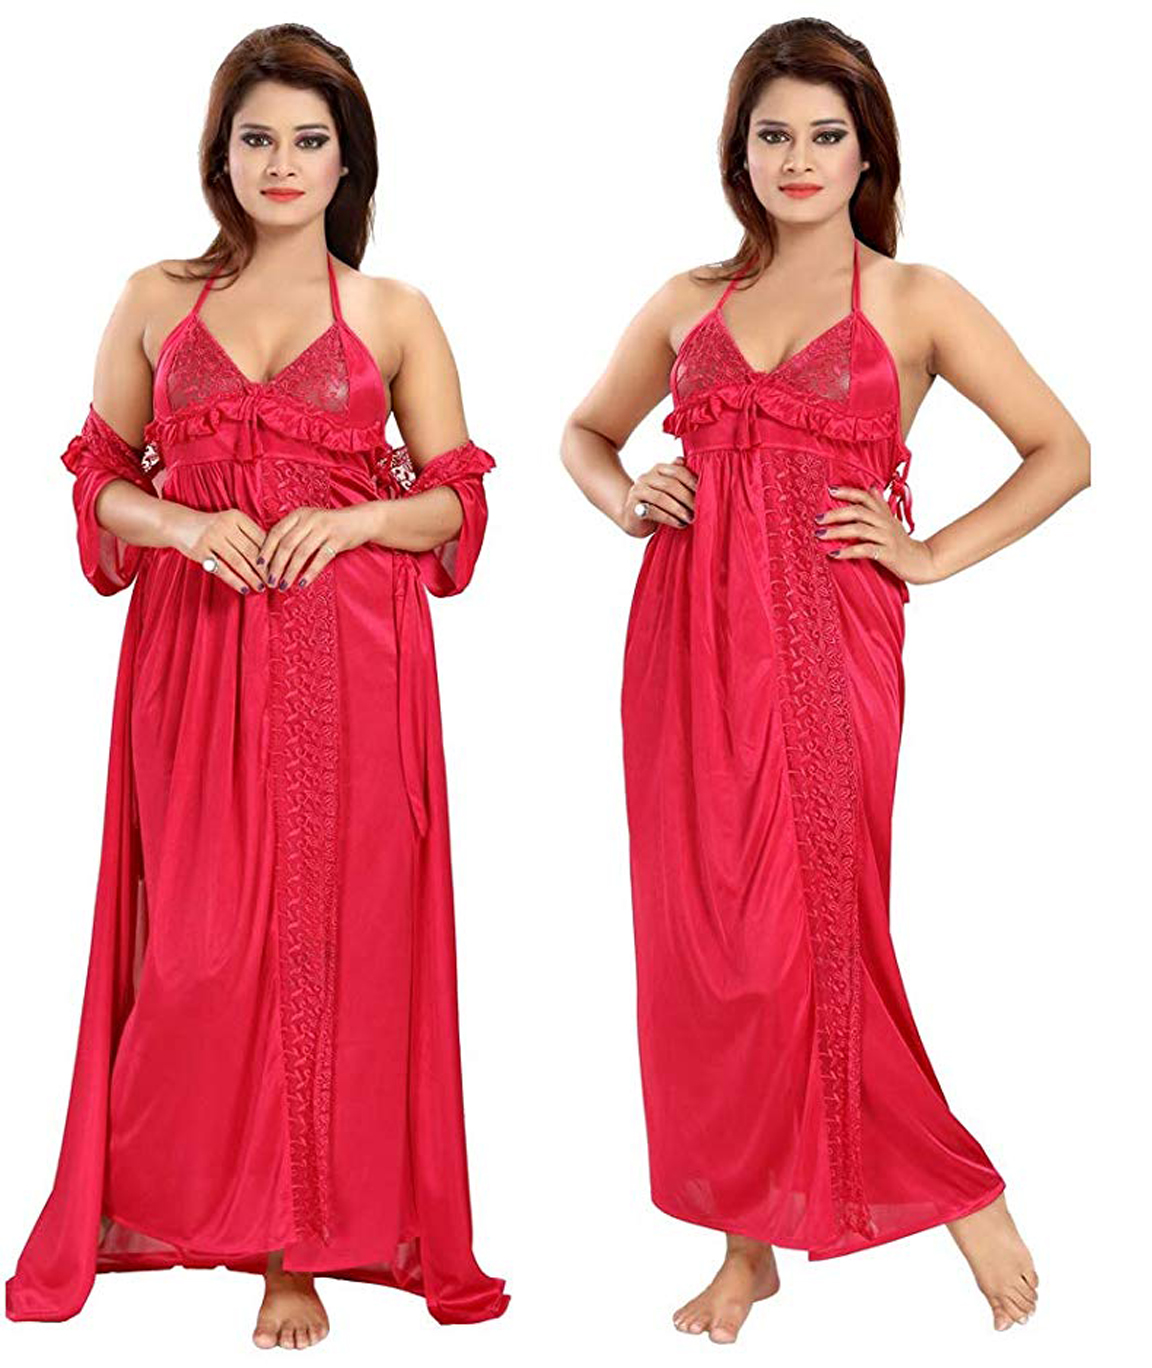 Romaisa Women`s Satin Nightwear Set of 6 Pcs Nighty, Wrap Gown, Top, Capri, Bra & Thong (Free Size) (Pack of 6)